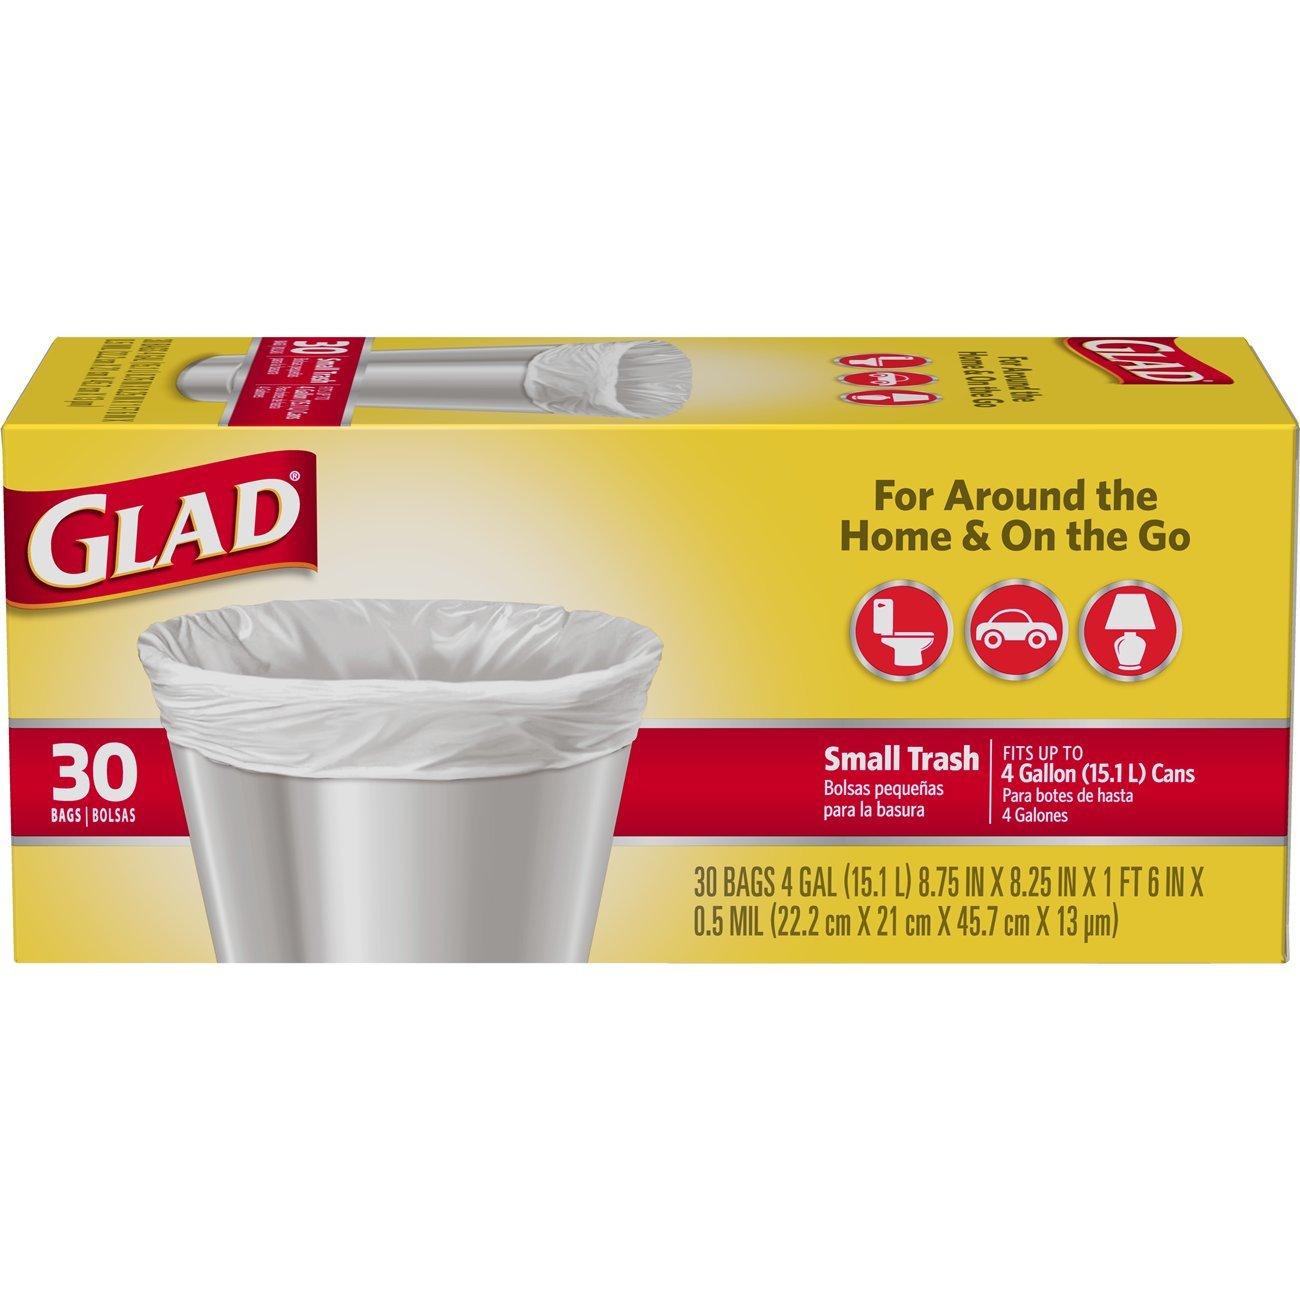 Glad Small Trash Bags - 4 Gallon White Trash Bag - 30 Count